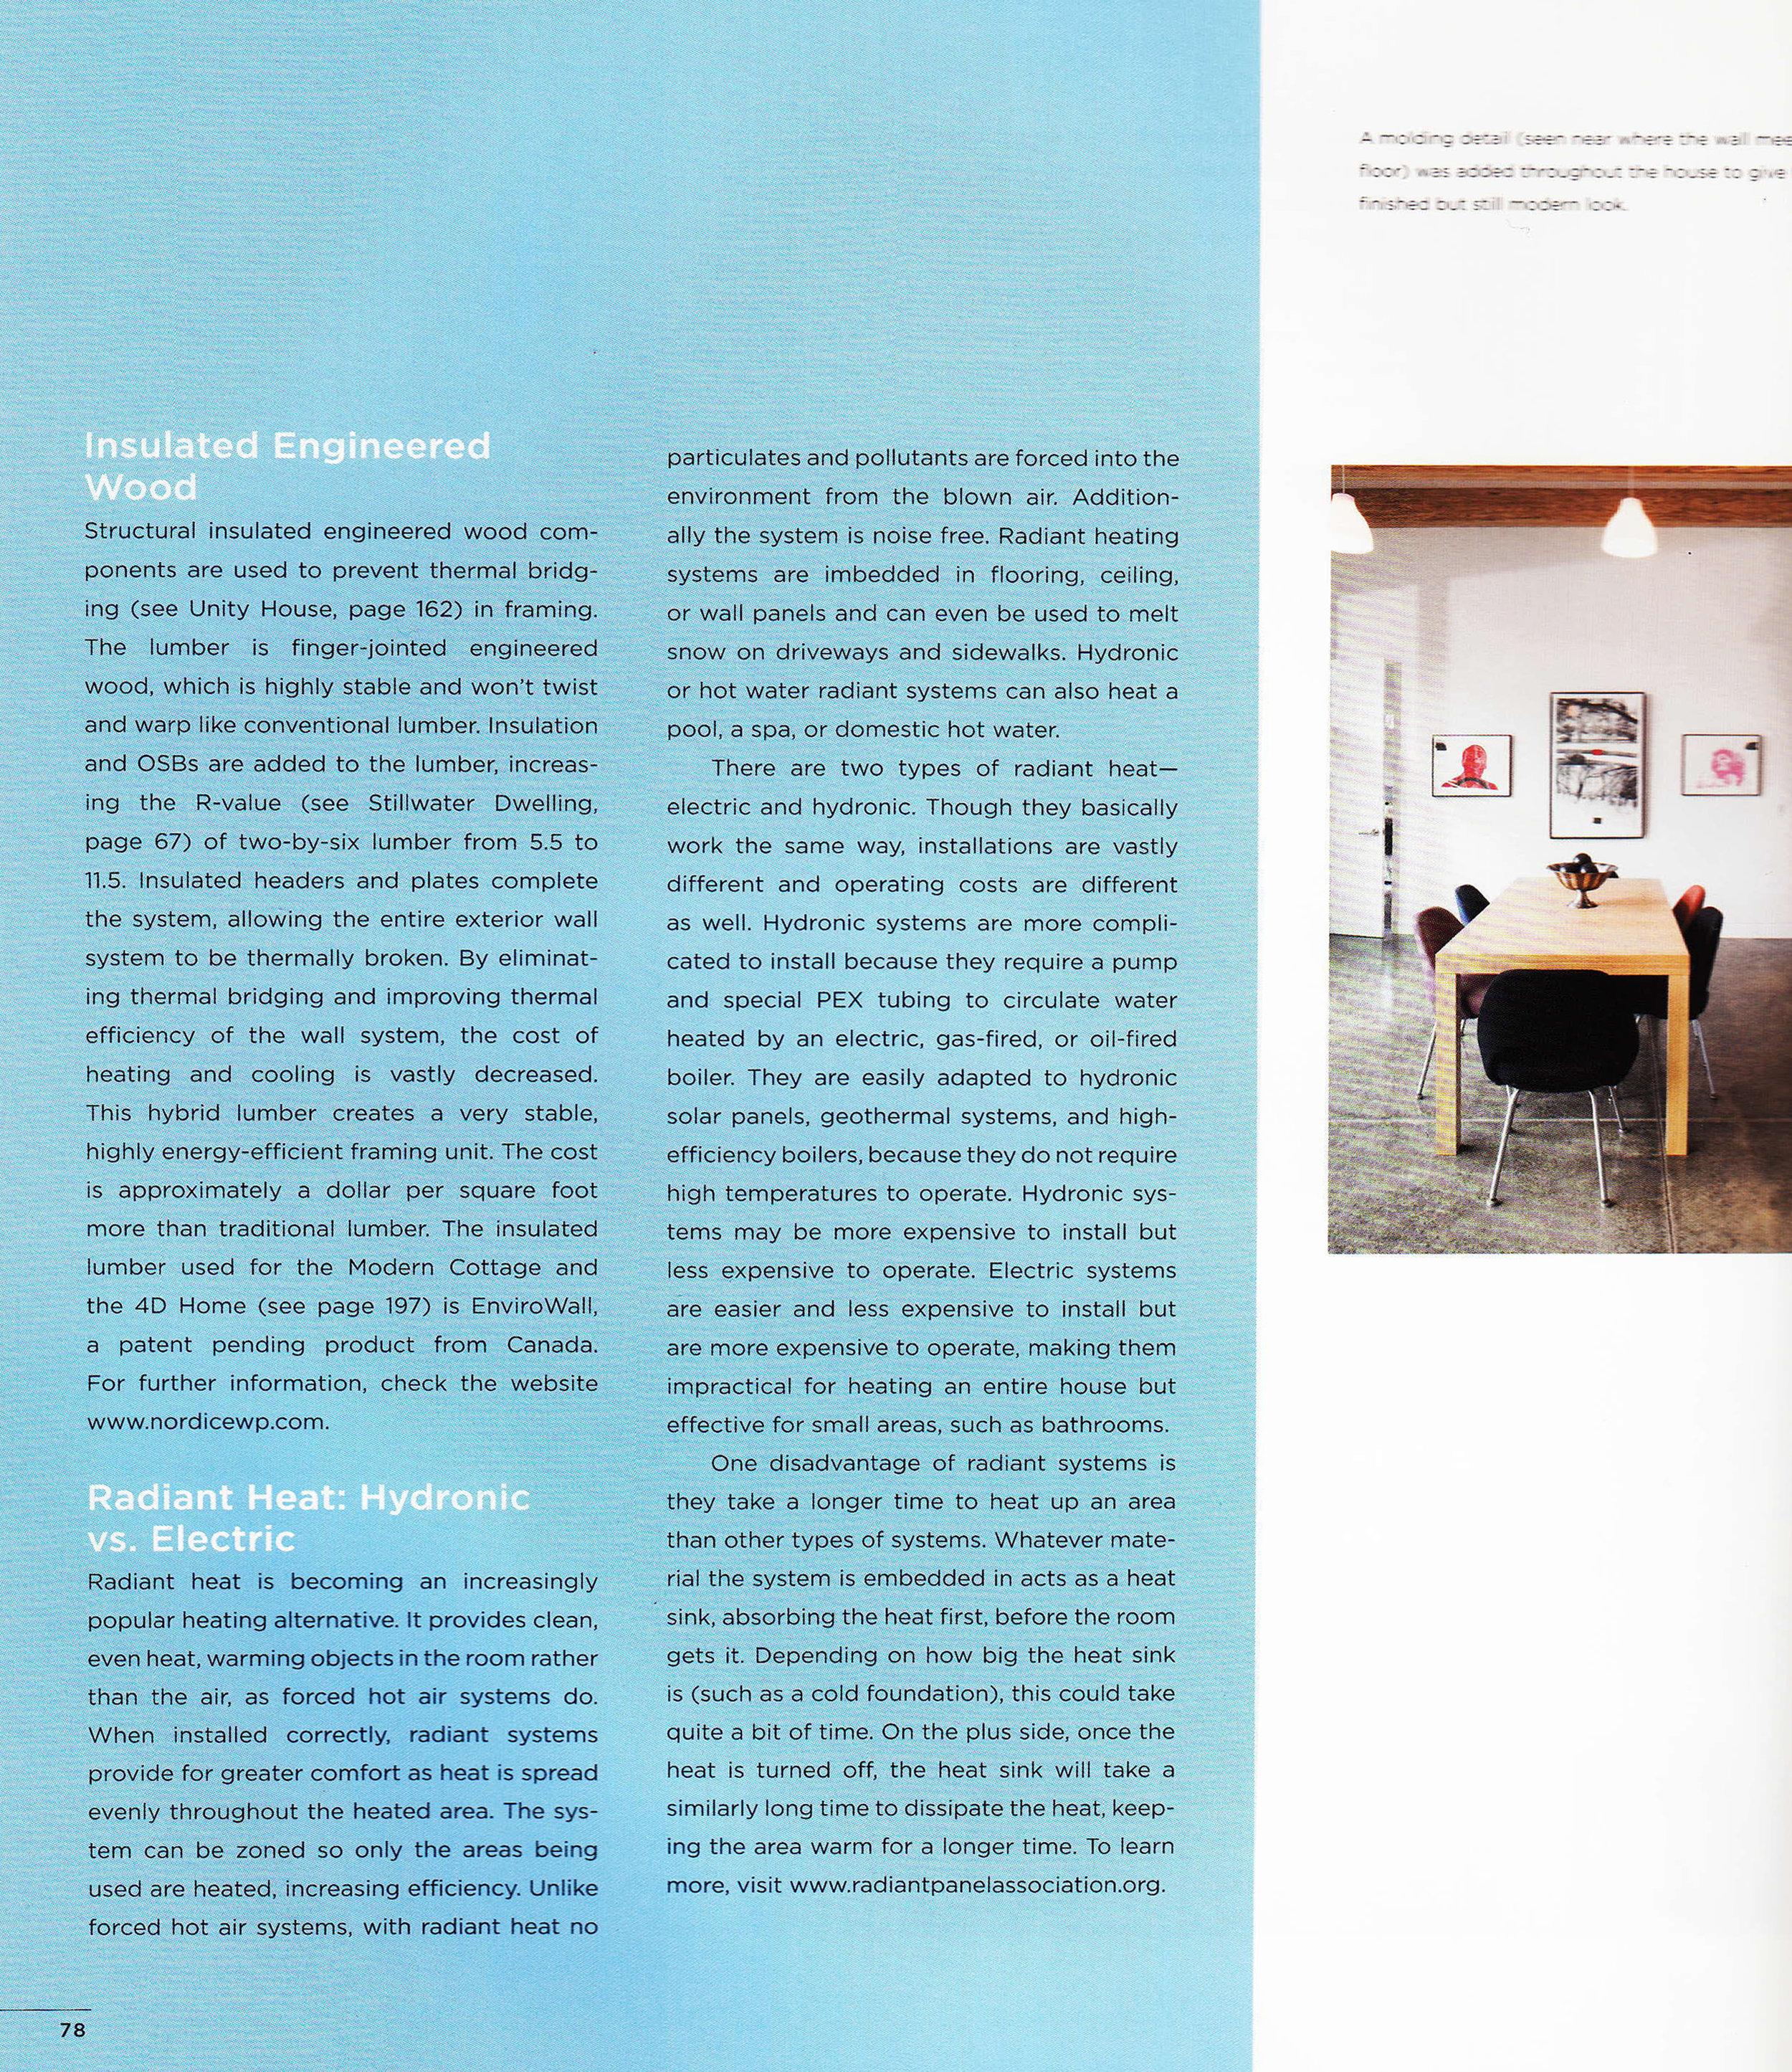 turkel_design_prefab_press_Modern_Cottage_Prefabuolus.6.jpg